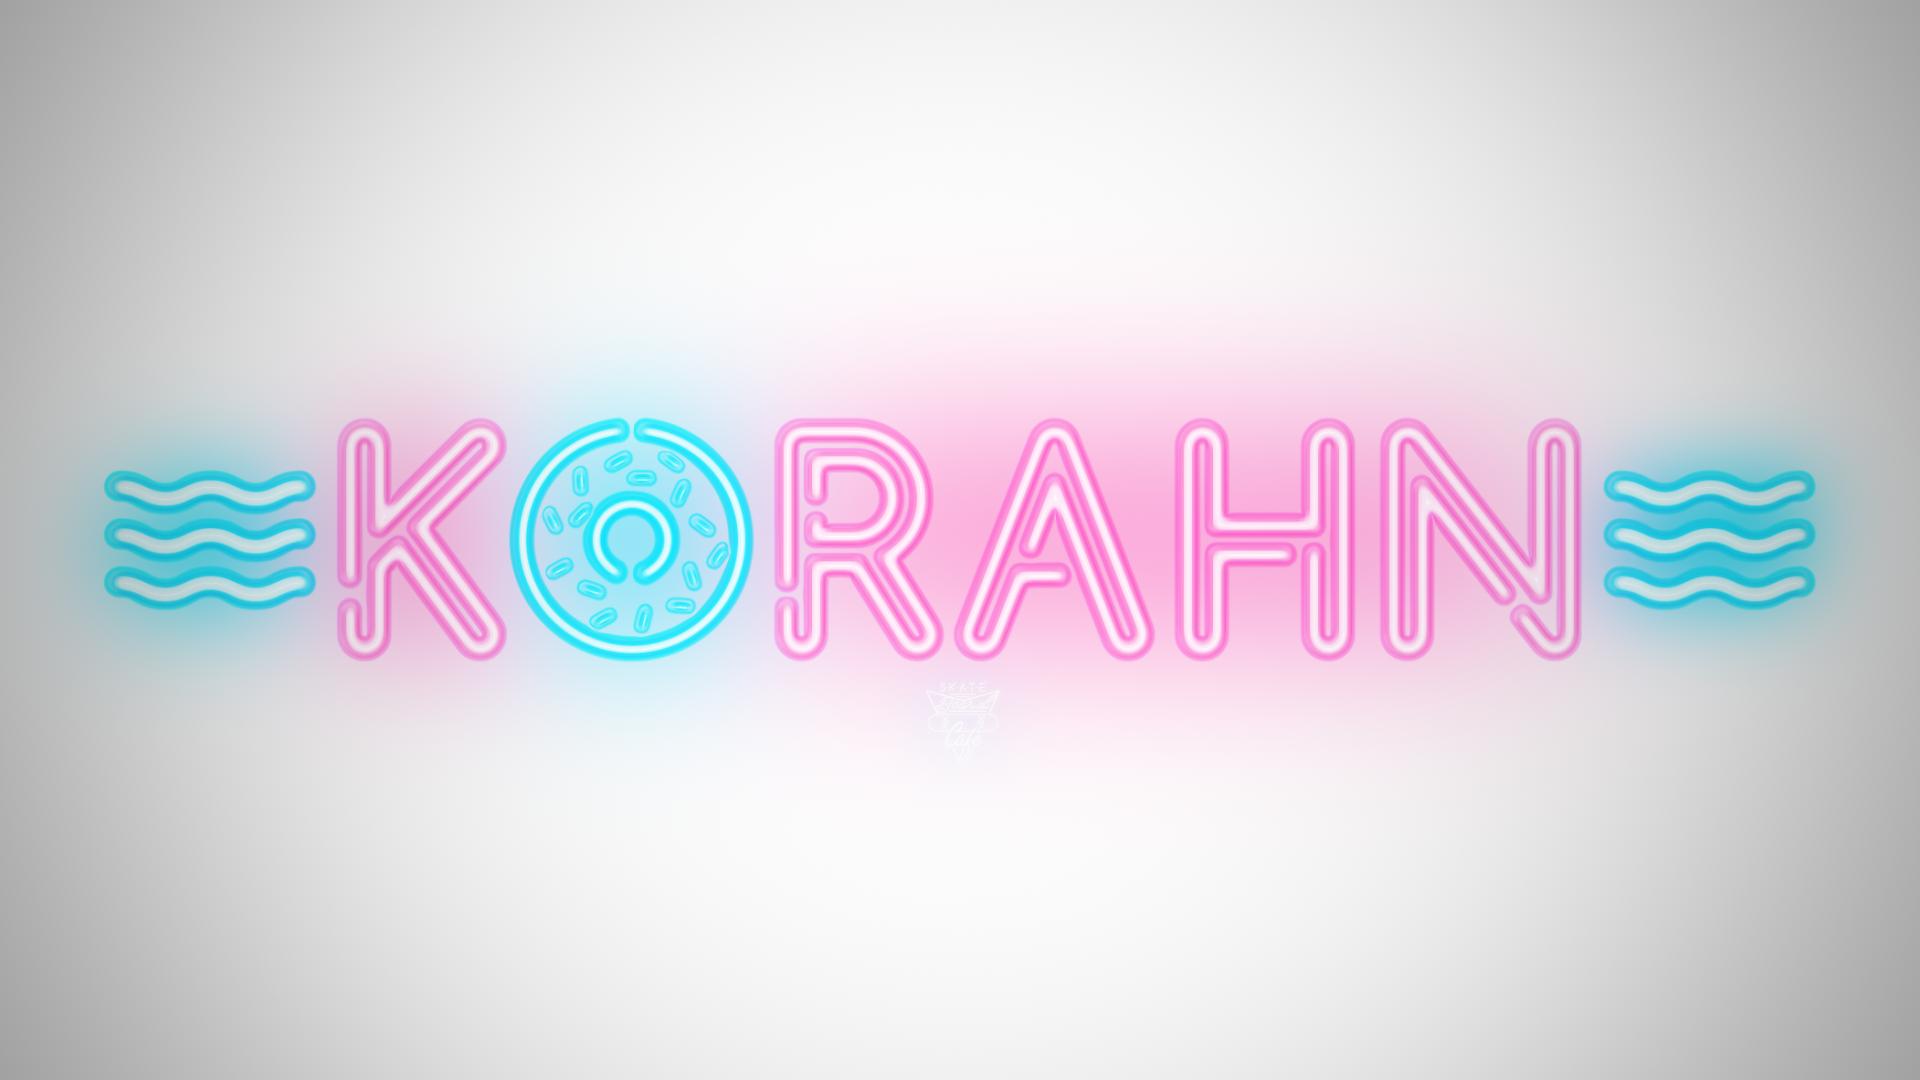 2015-06-Skate-Cafe-KORAHN-neon-glow-main-white-00125